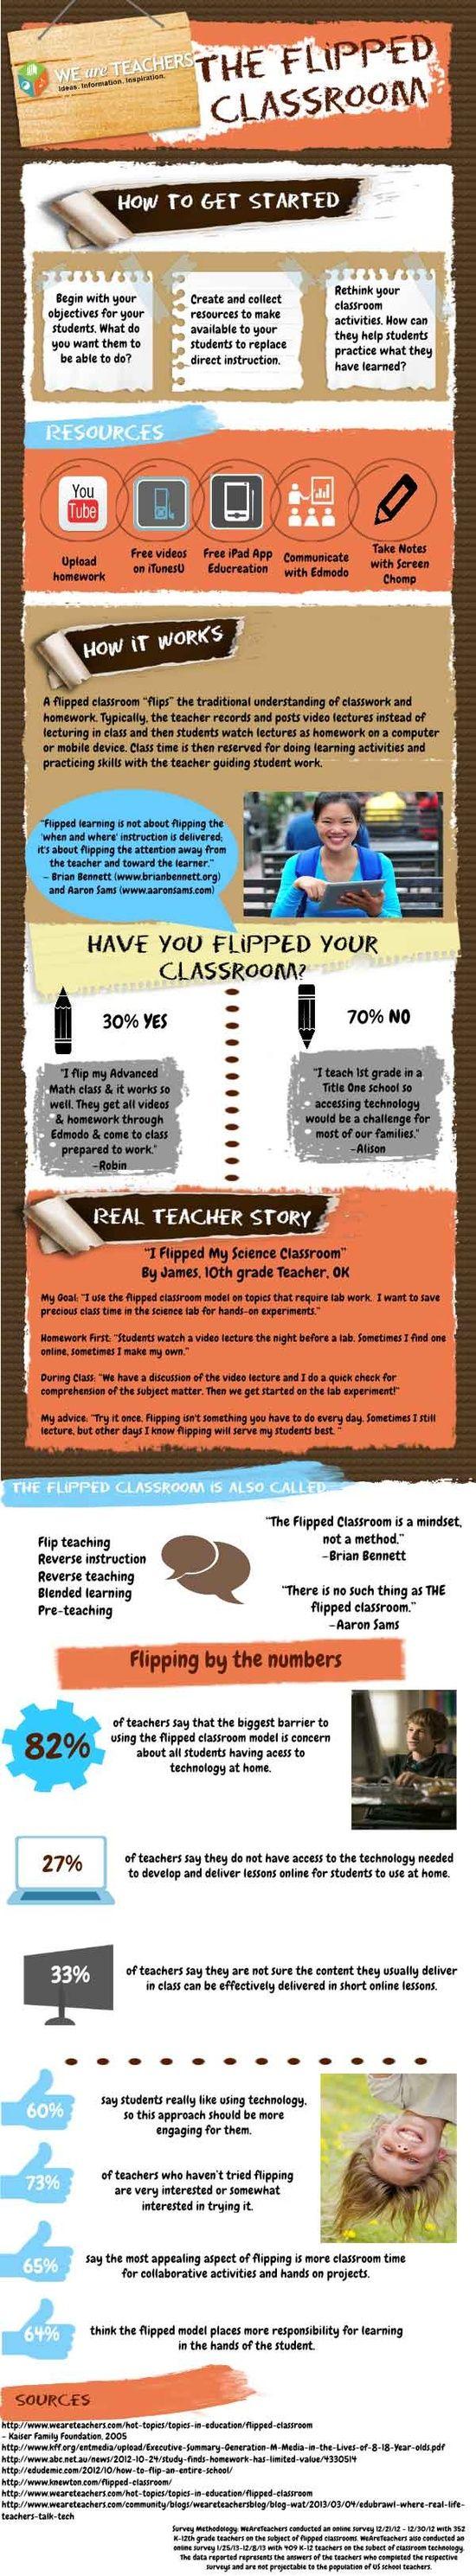 Profa Baros's Classroom: Flipping my TPRS classroom